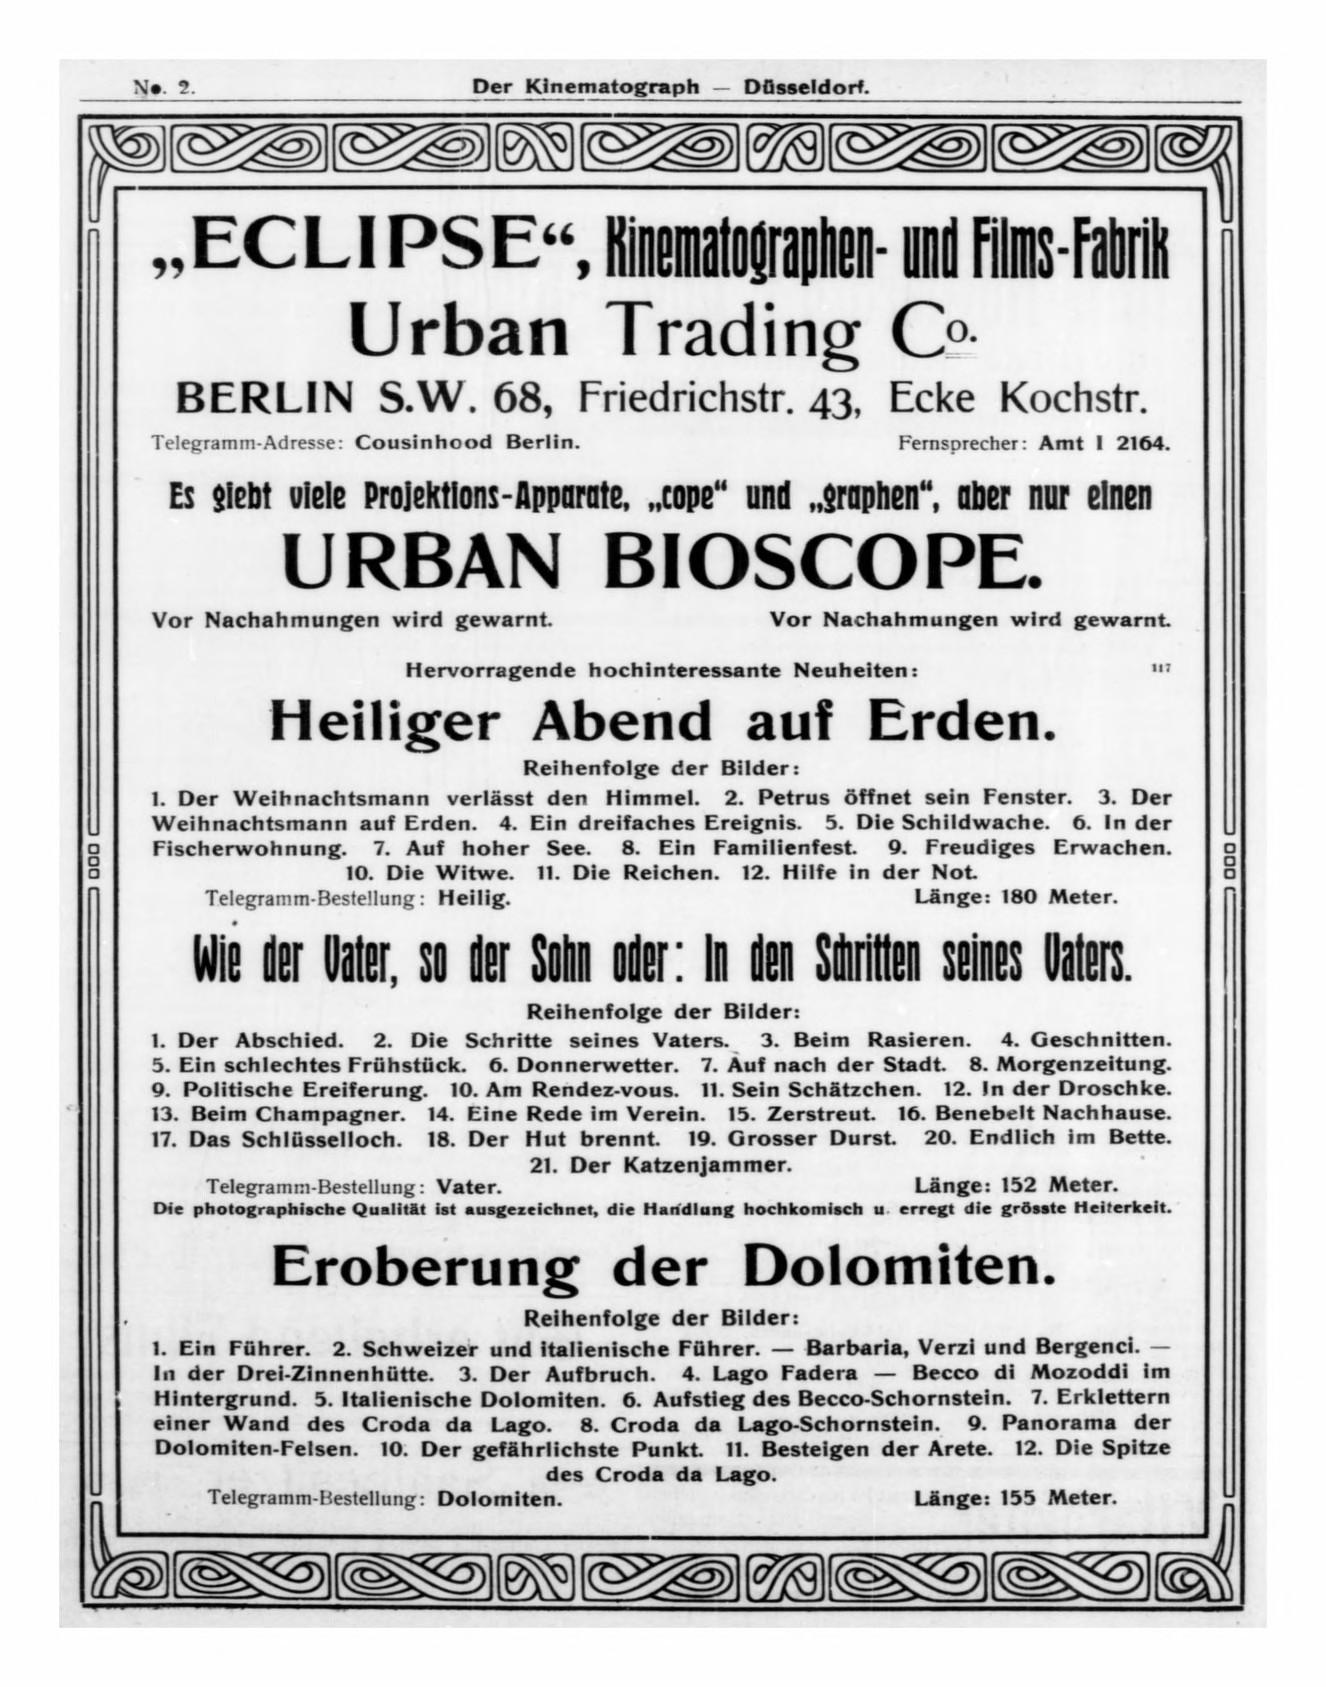 Kinematograph01-1907-01_jp2.zip&file=kinematograph01-1907-01_jp2%2fkinematograph01-1907-01_0021